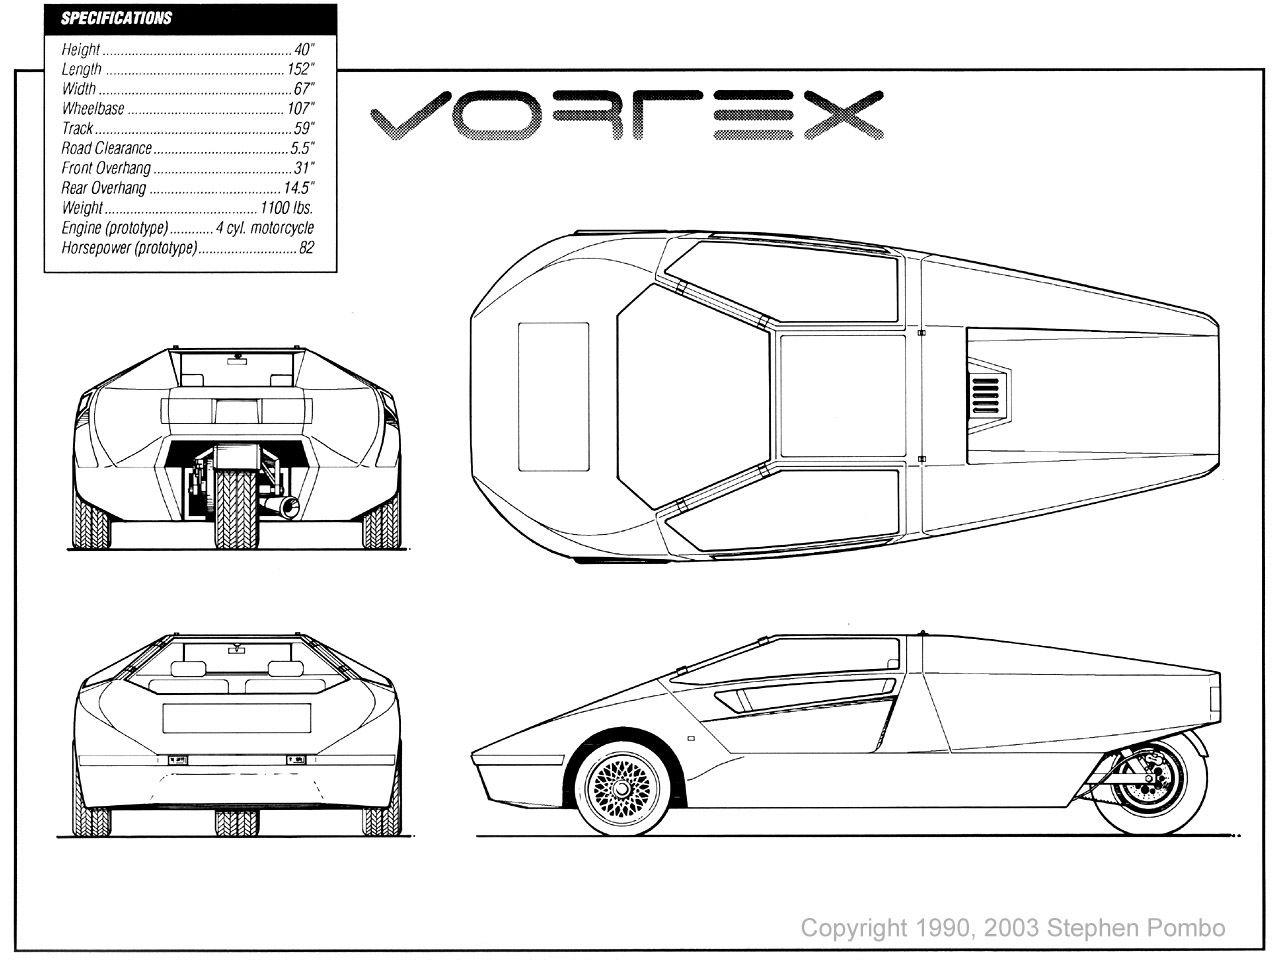 The Vortex Plans Page